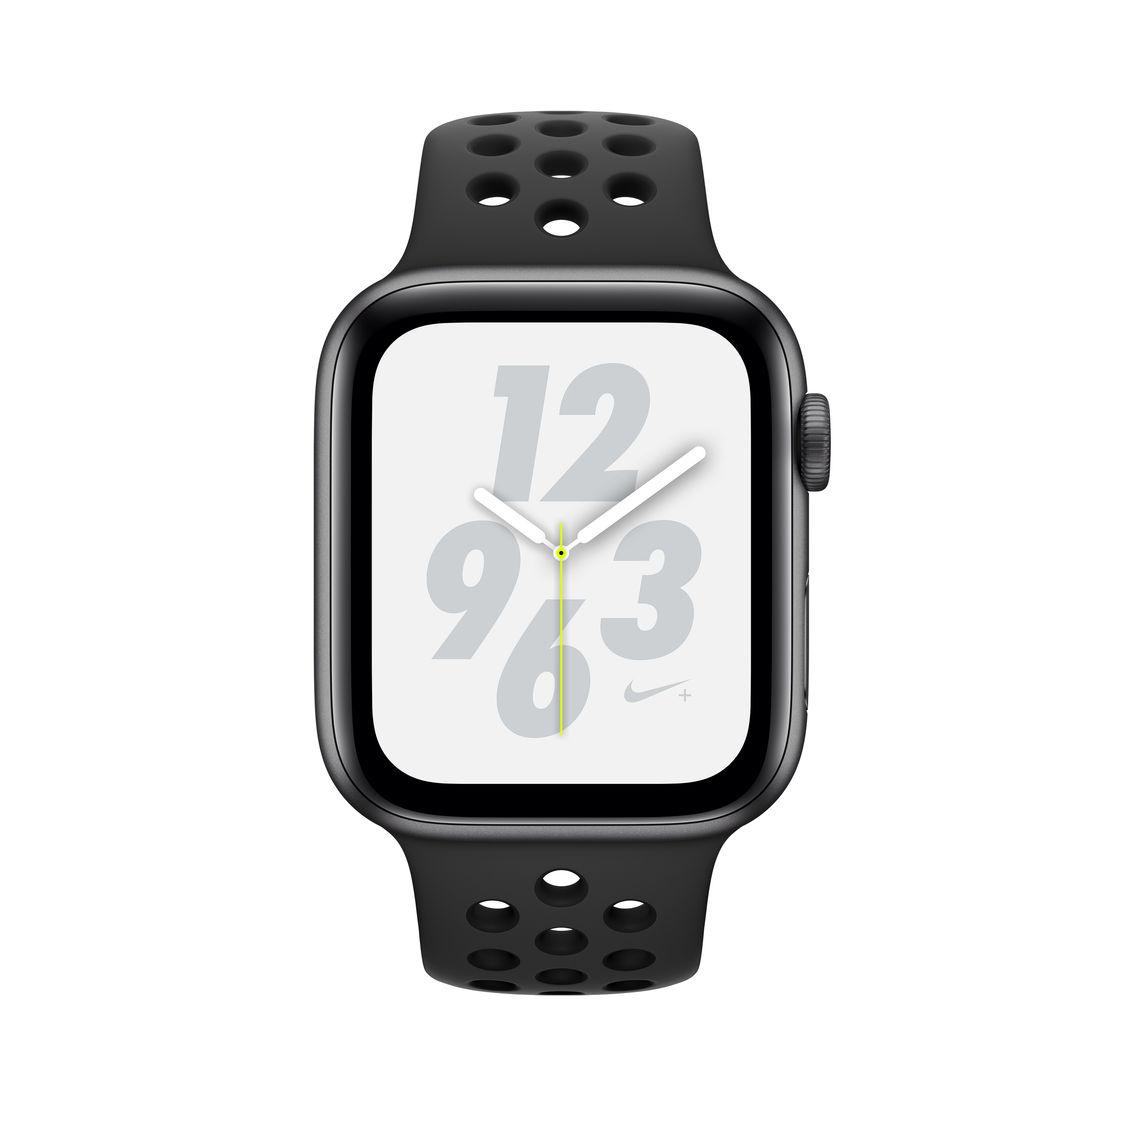 Refurbished Apple Watch Nike+ Series 4 GPS, 40mm Space Grey Aluminium Case with AnthraciteBlack Nike Sport Band